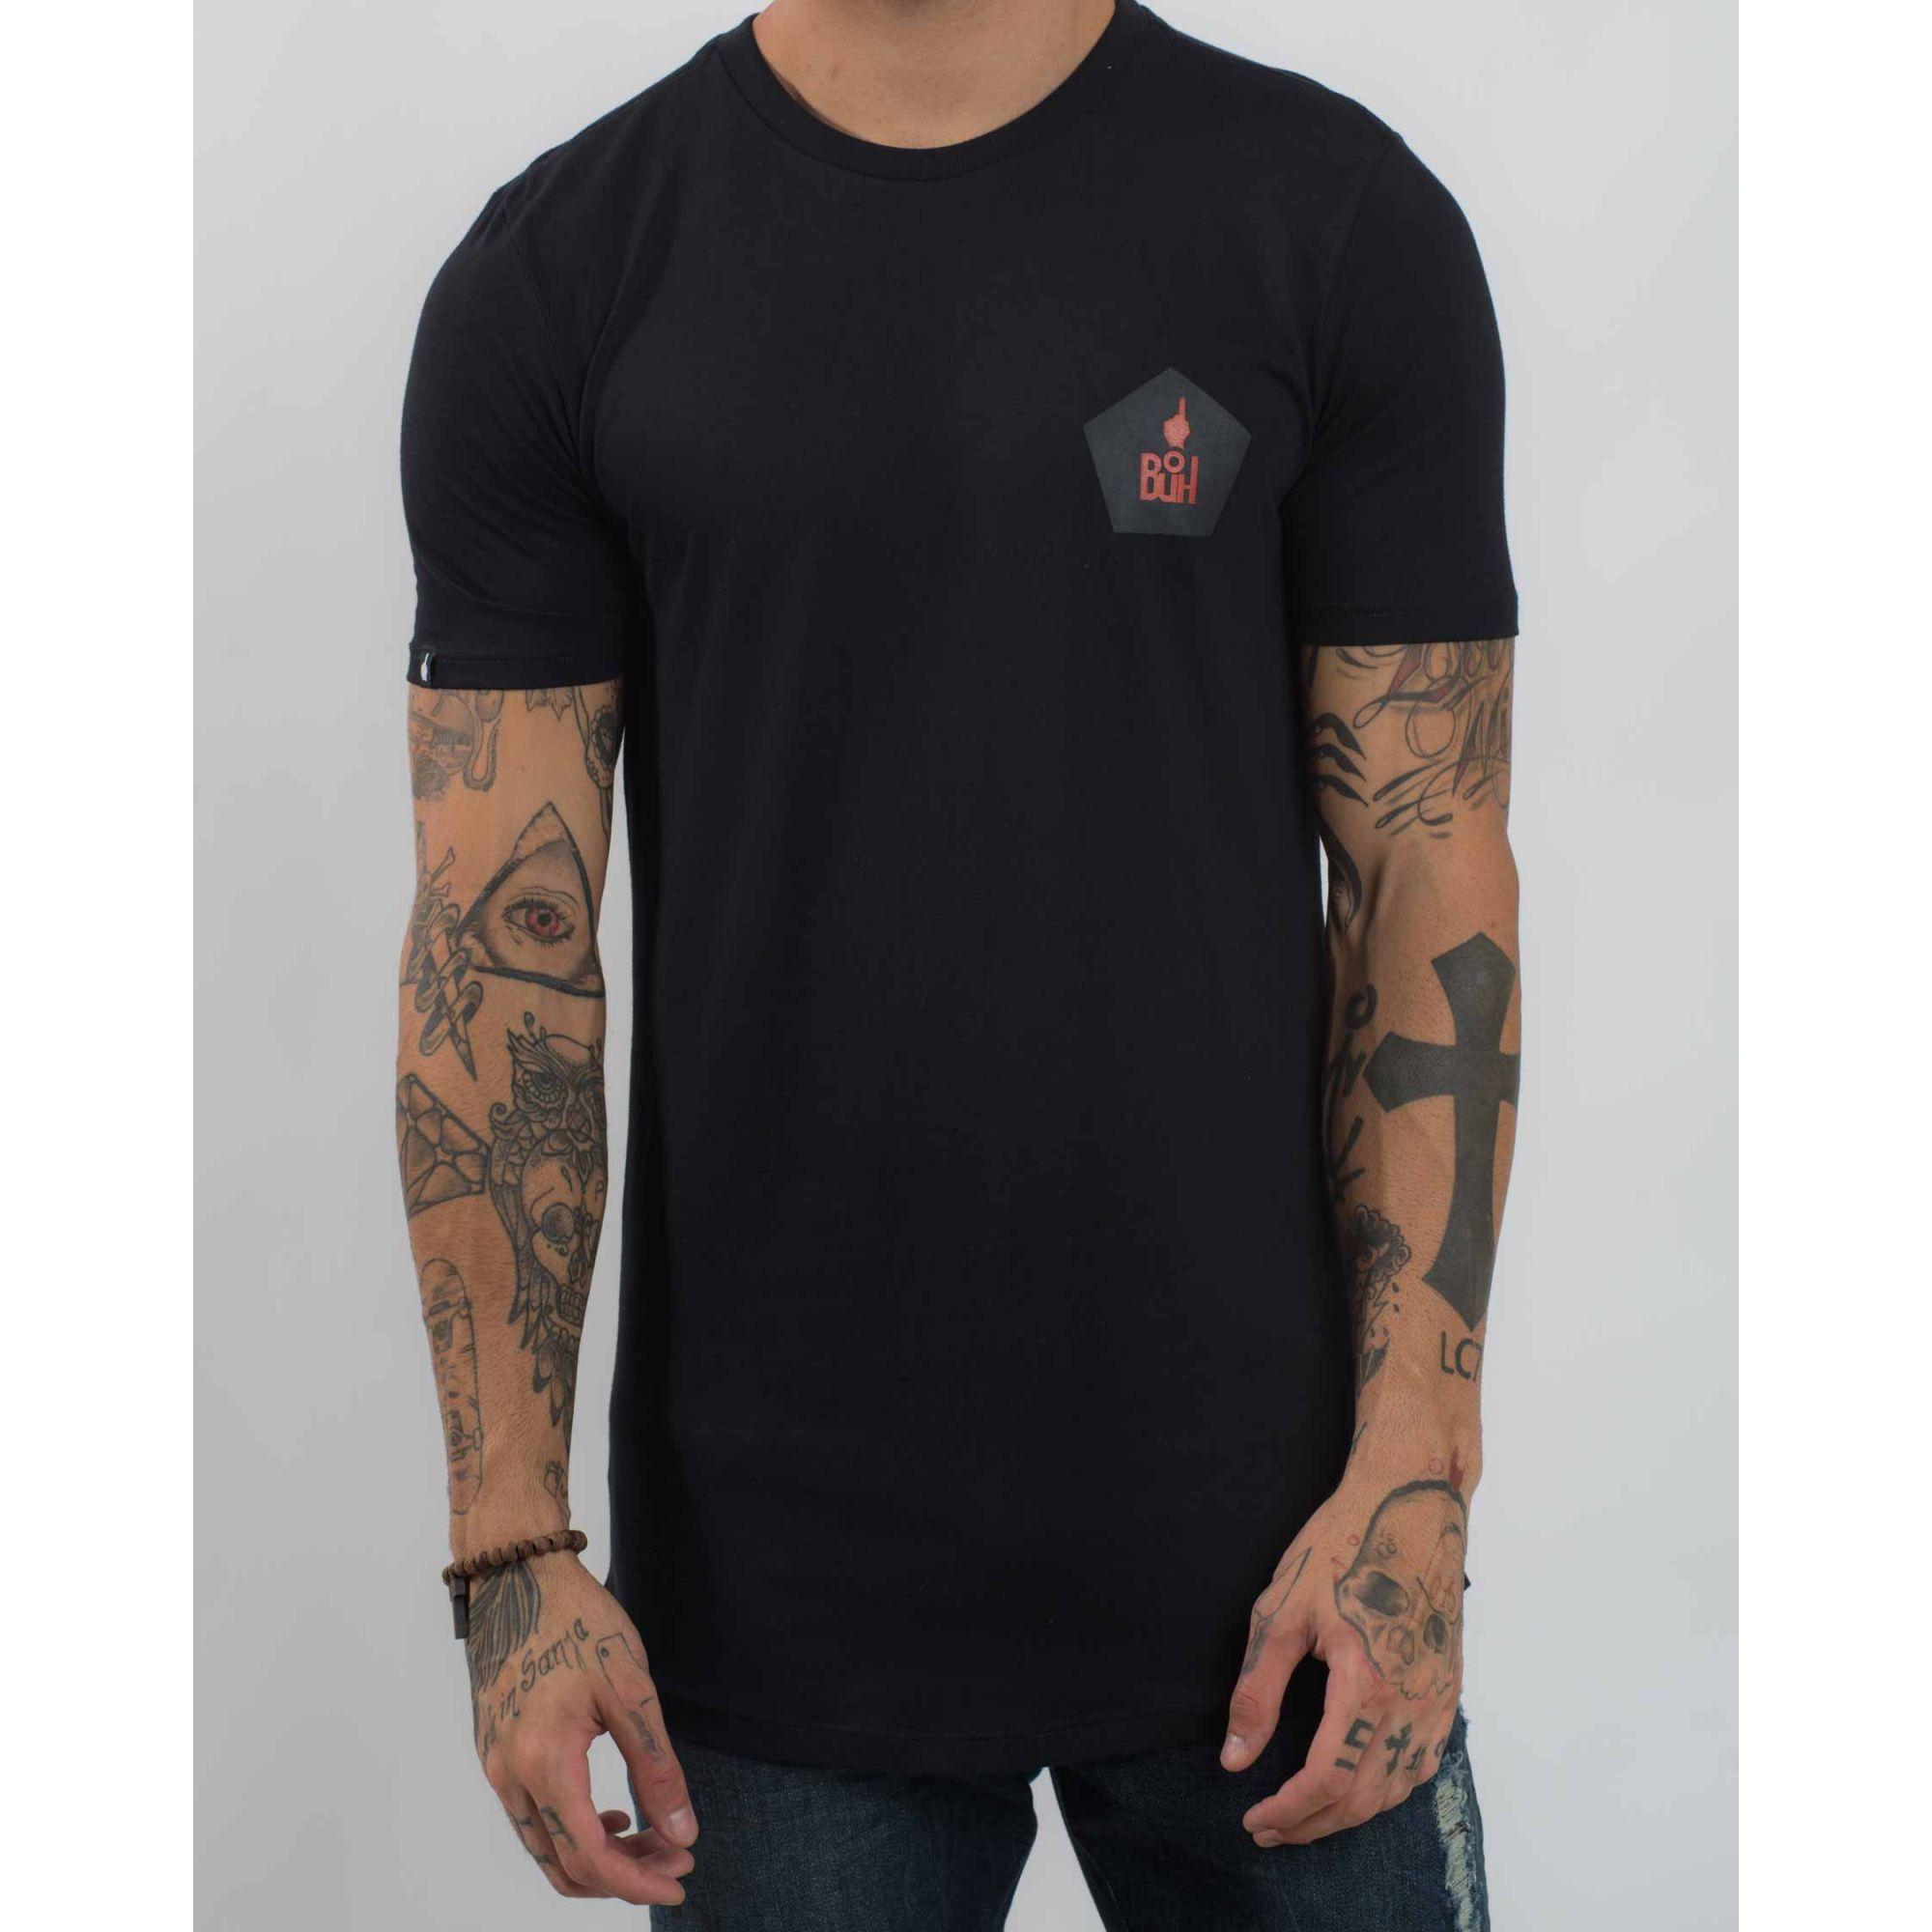 Camiseta Buh Post Soccer Black